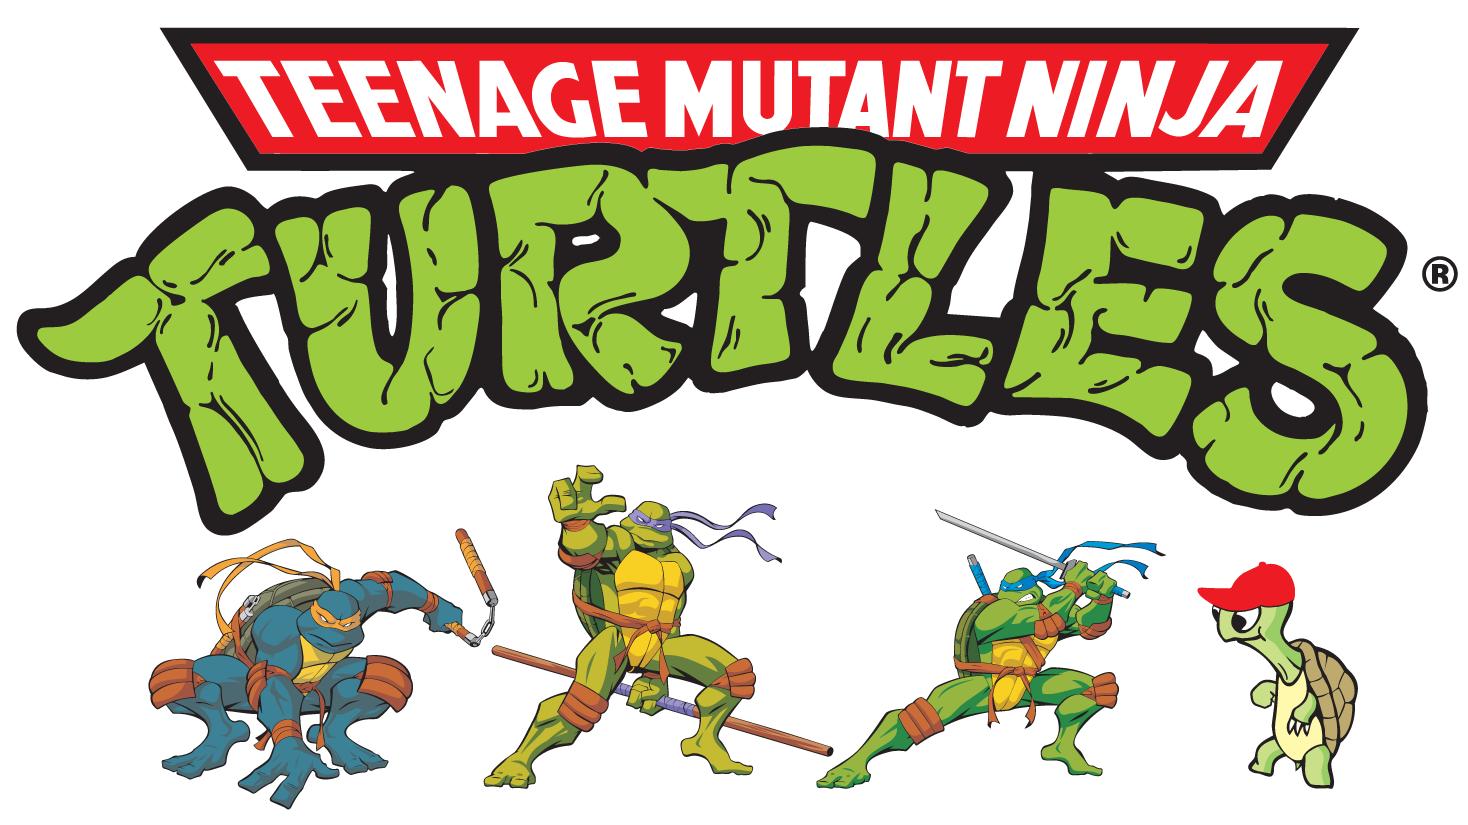 Logo clipart ninja turtle TV Lunki  the and